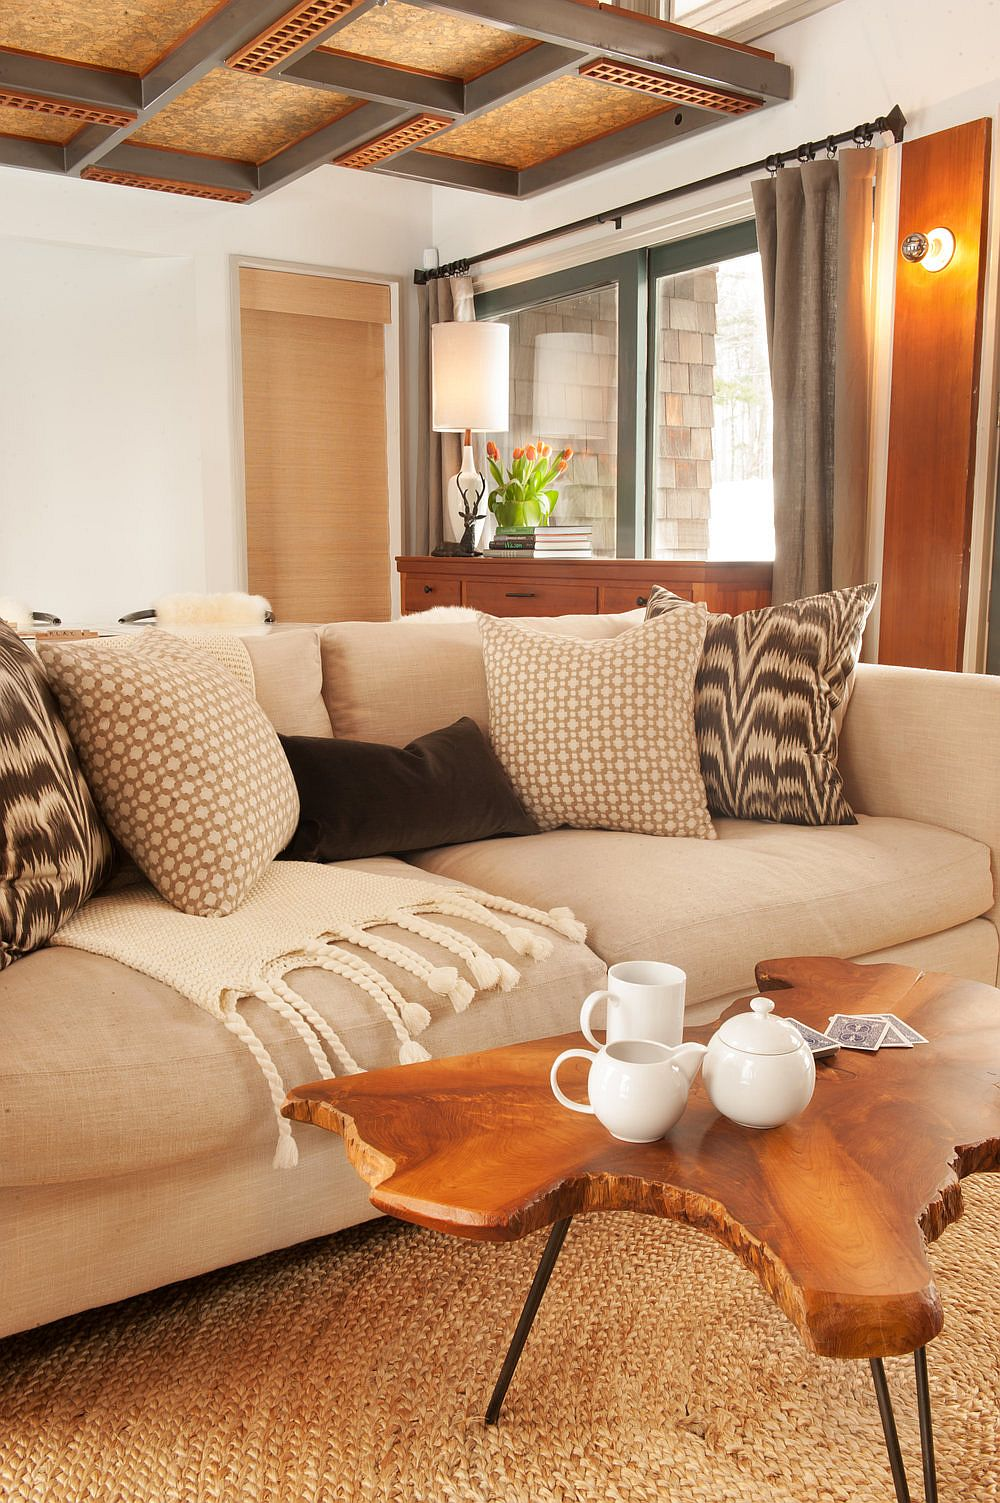 Natural edge coffee table for the ski retreat style interior